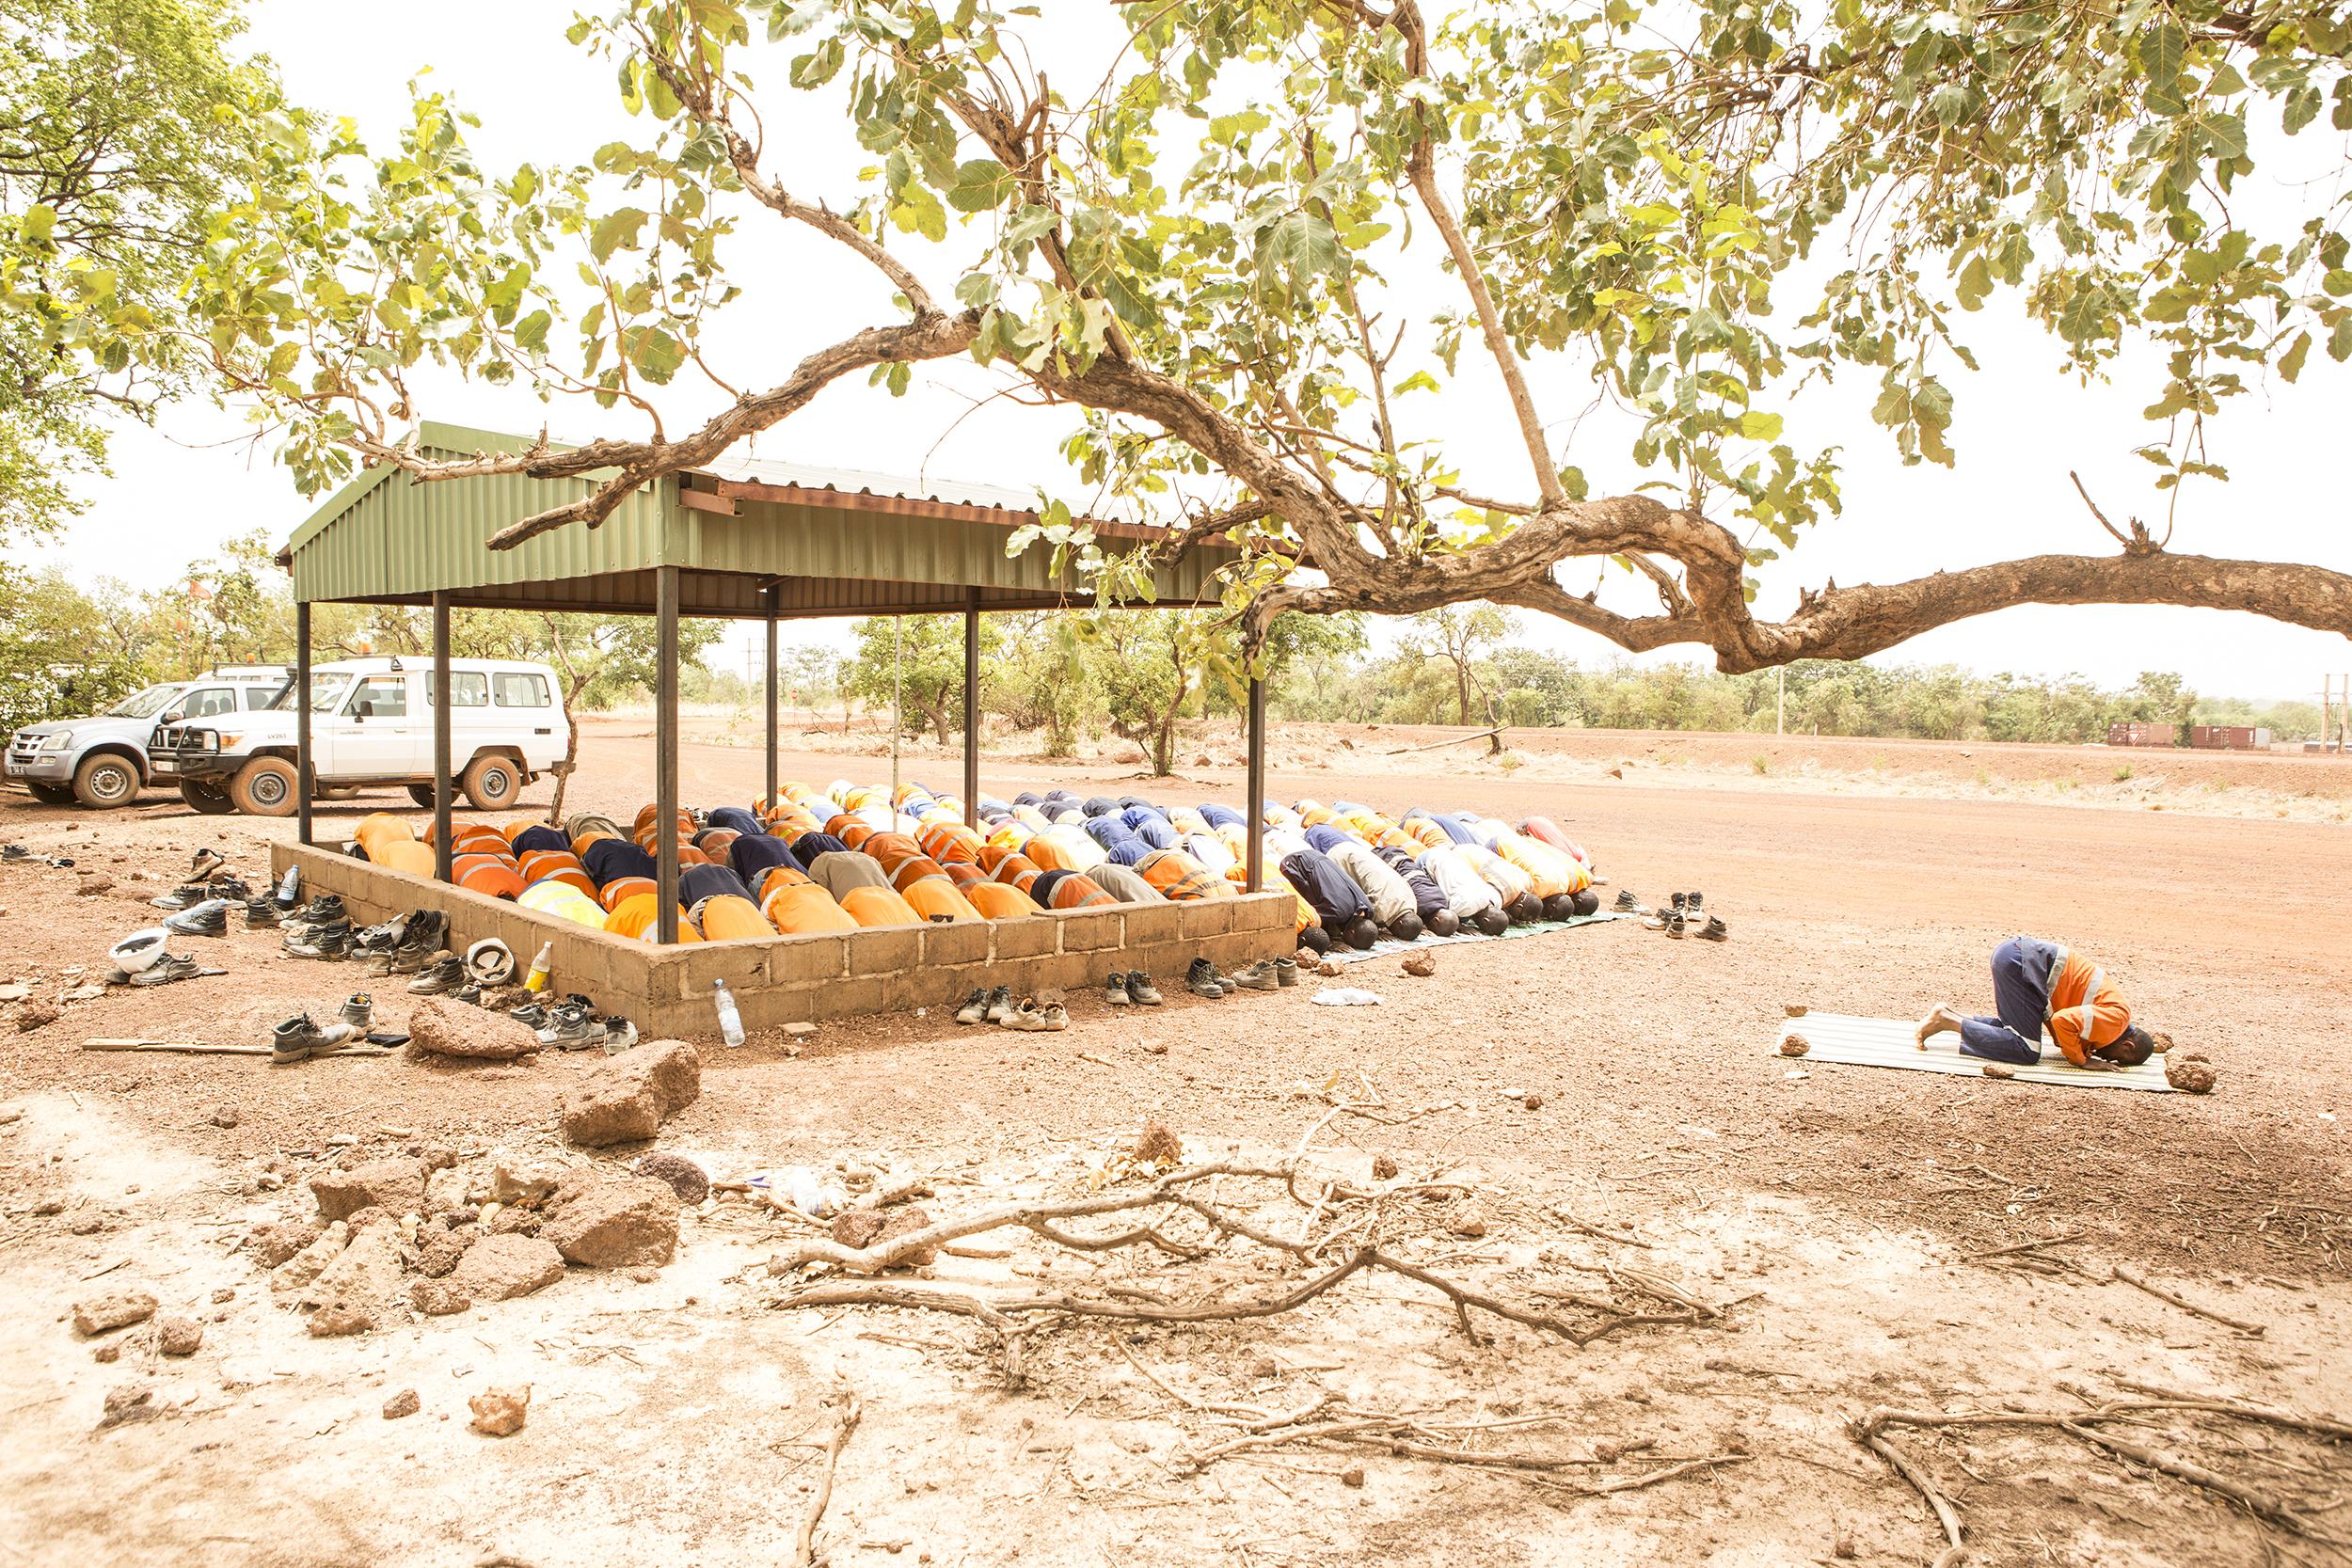 Lunchtime Prayer Session, Sabodala Gold Mine, Senegal, 2012. Edition of 3.